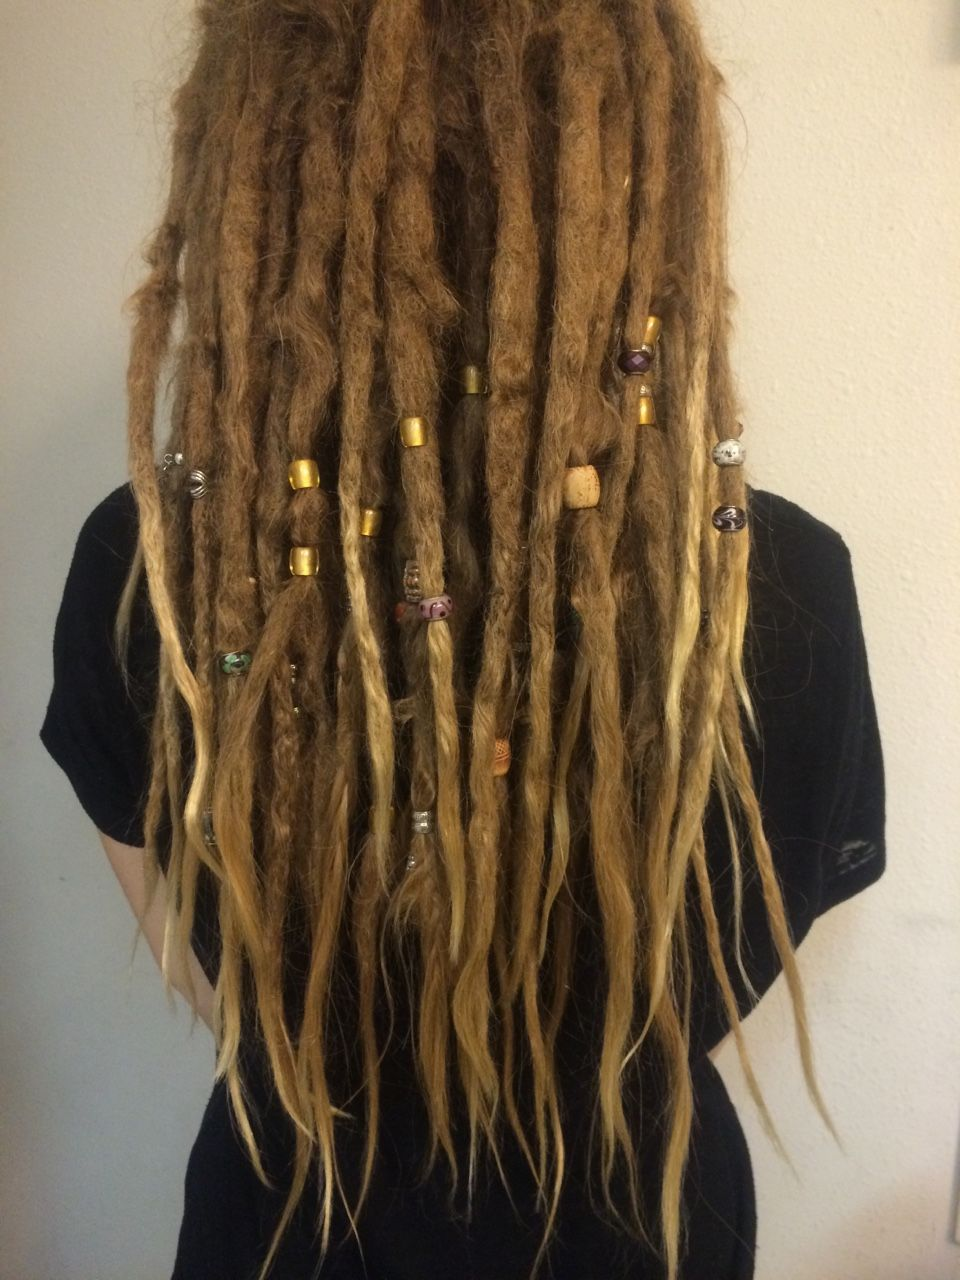 Love her beads.......